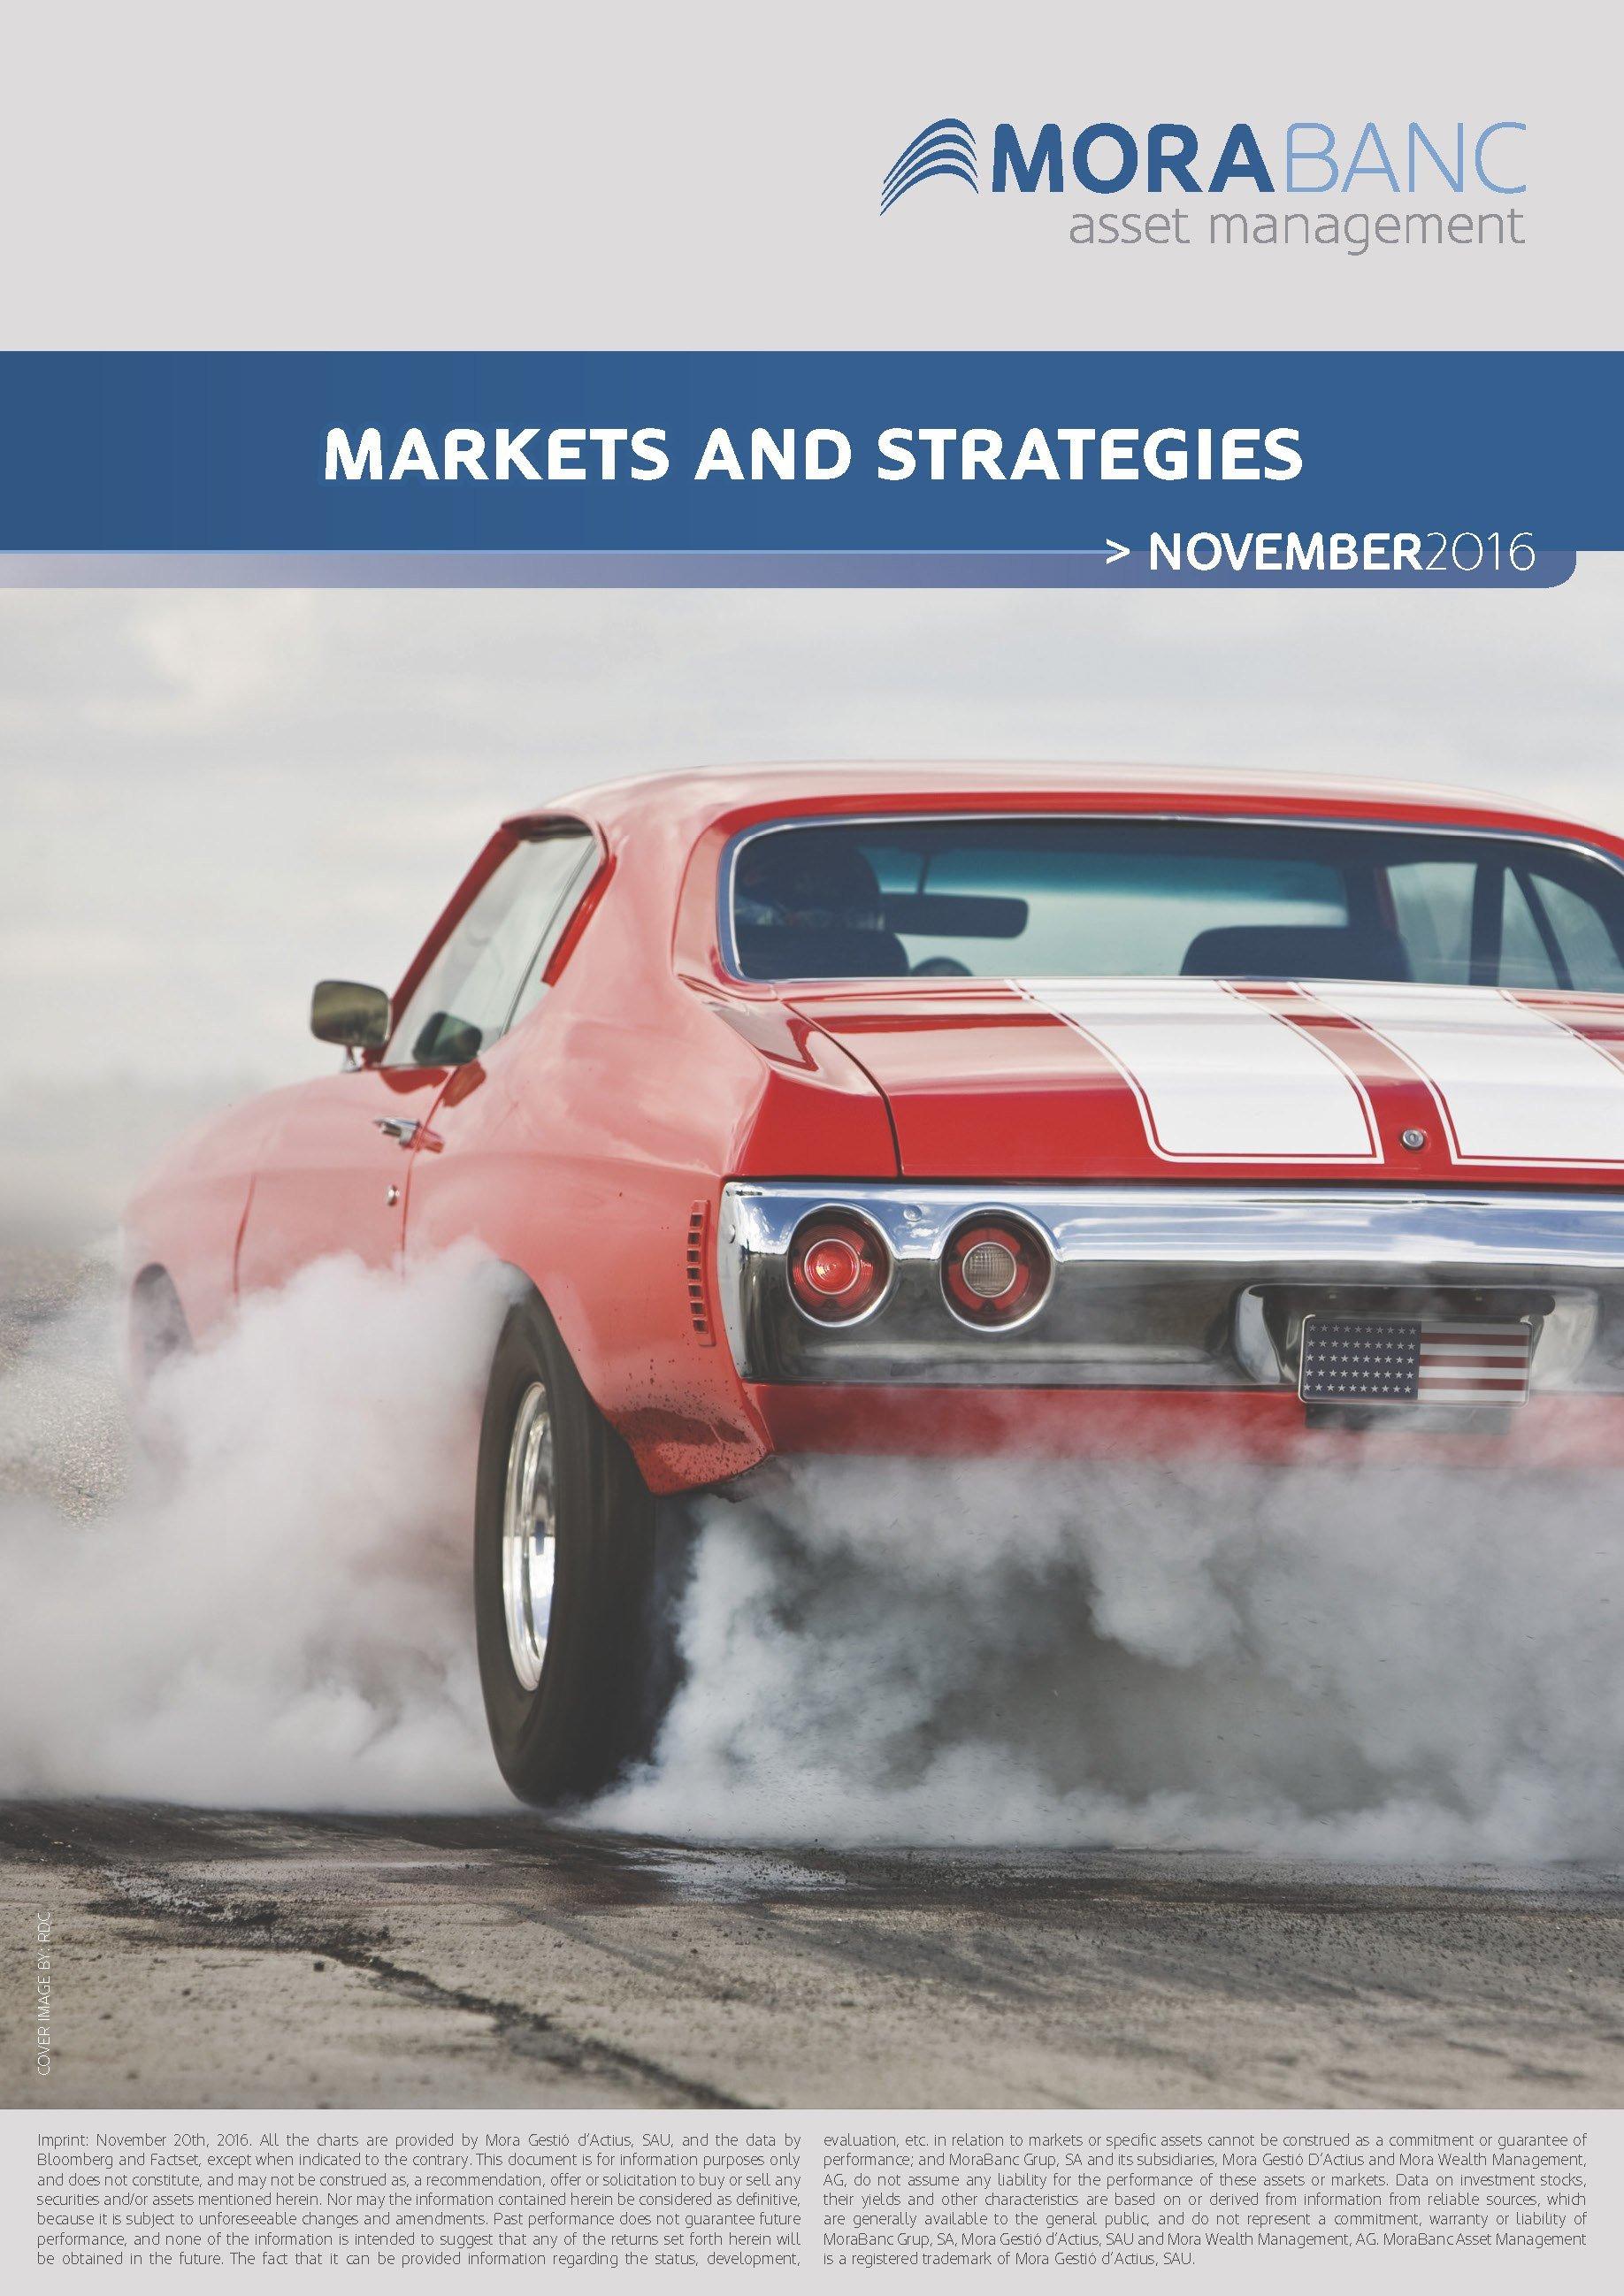 Markets and Strategies November 2016